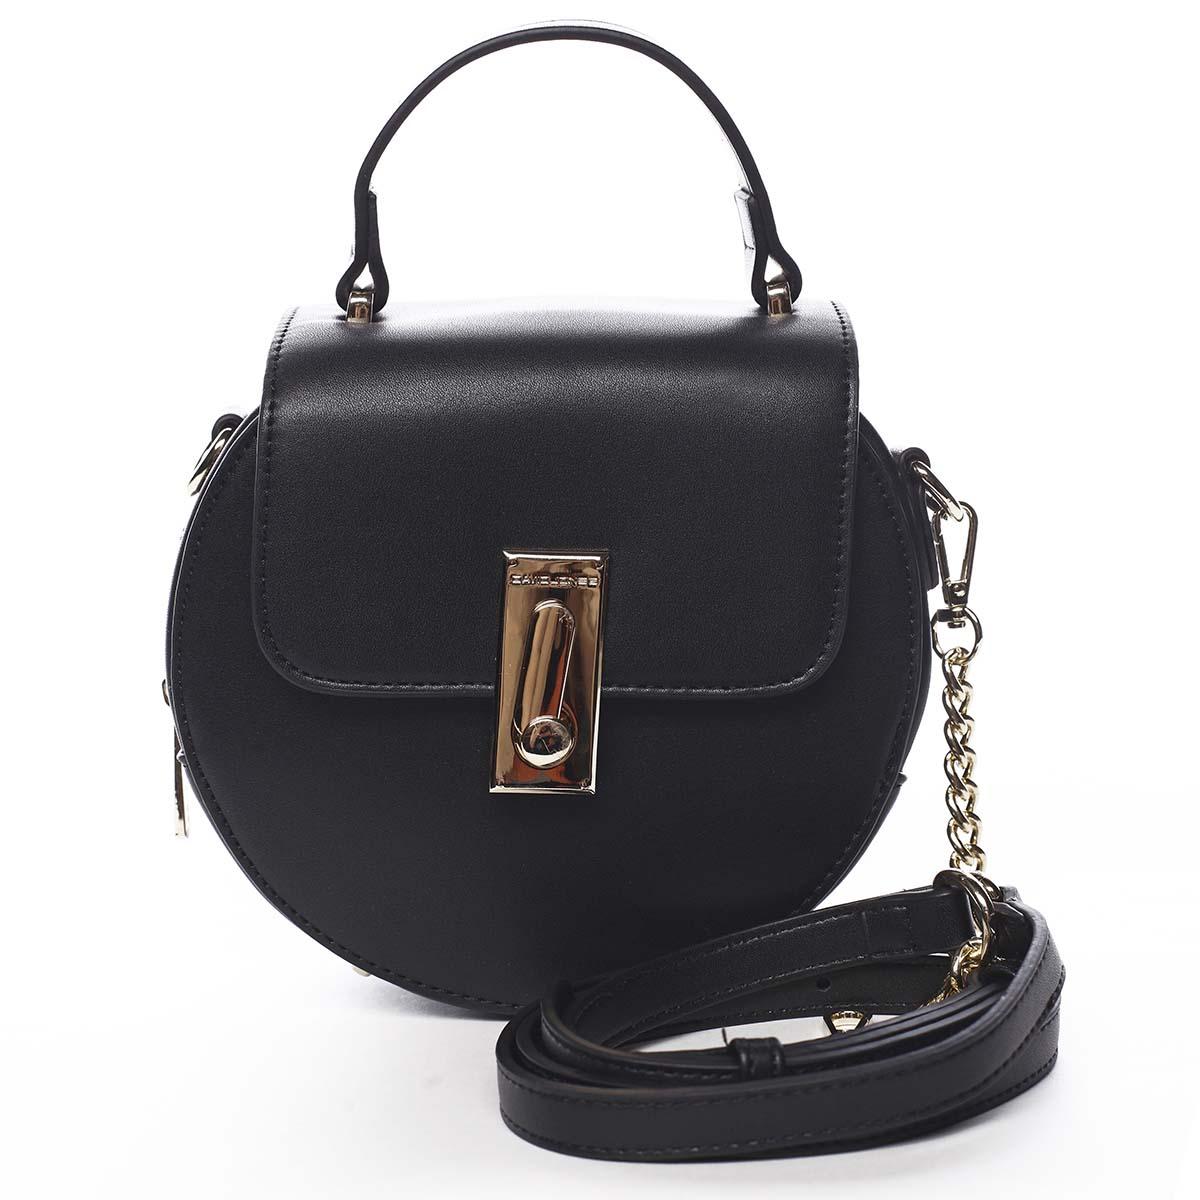 Luxusná dámska kabelka čierna - David Jones Magnify čierna